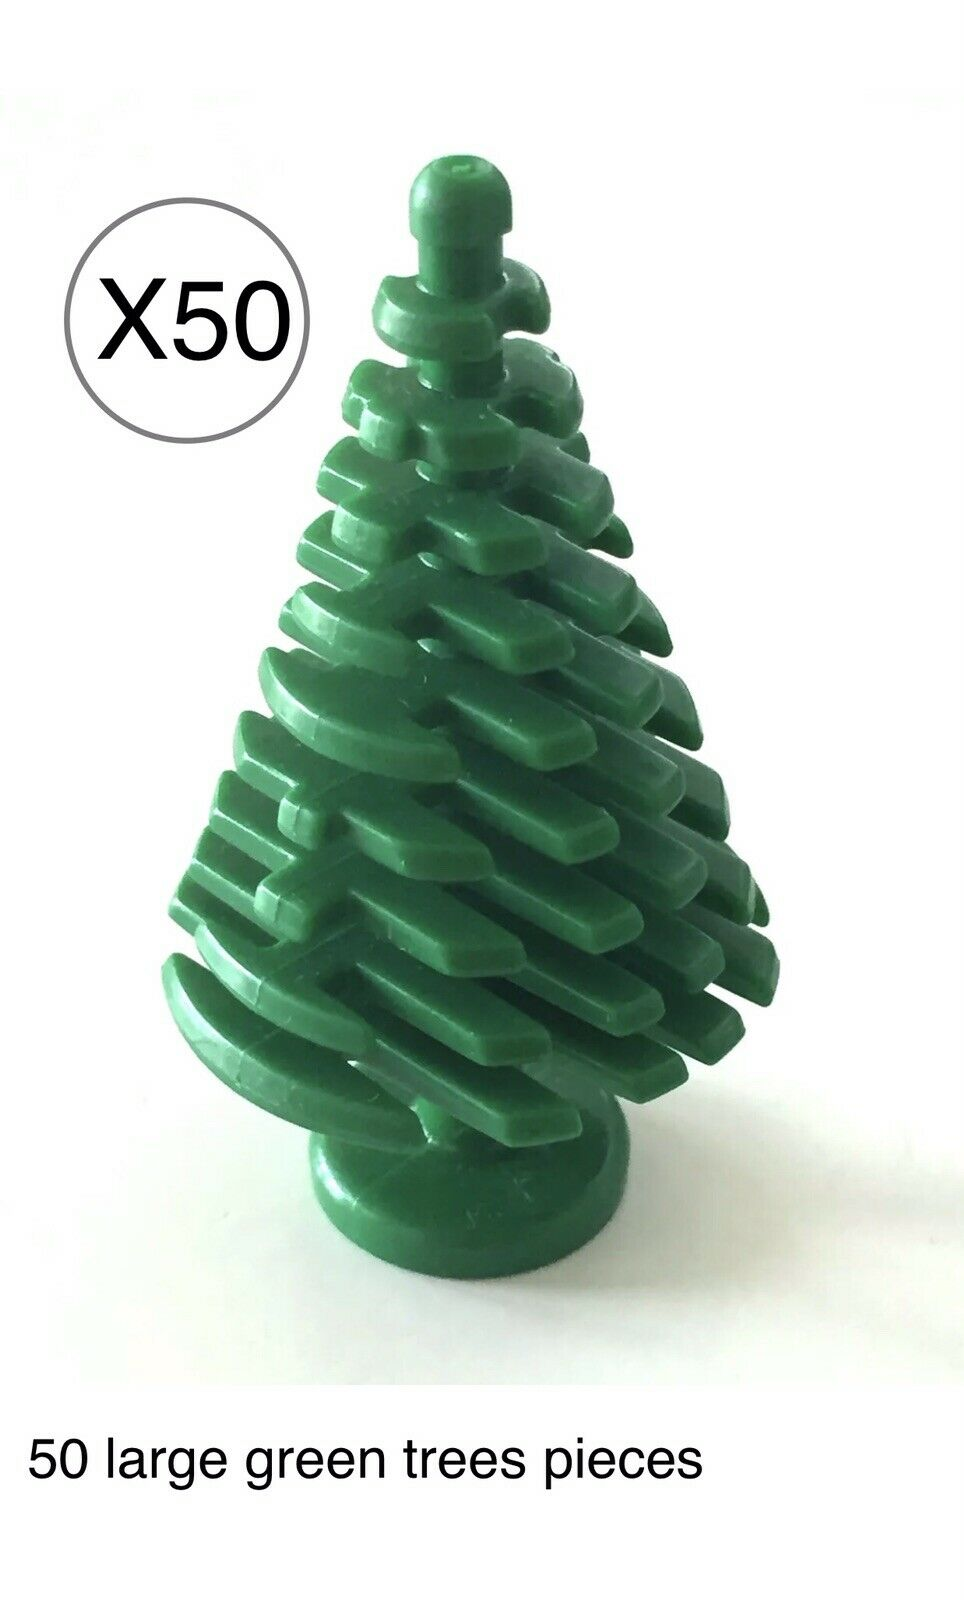 Lego 50 Grün Large Pine Tree 4 x 4 x 6 2 3 City   Christmas   Bulk Parts Lot